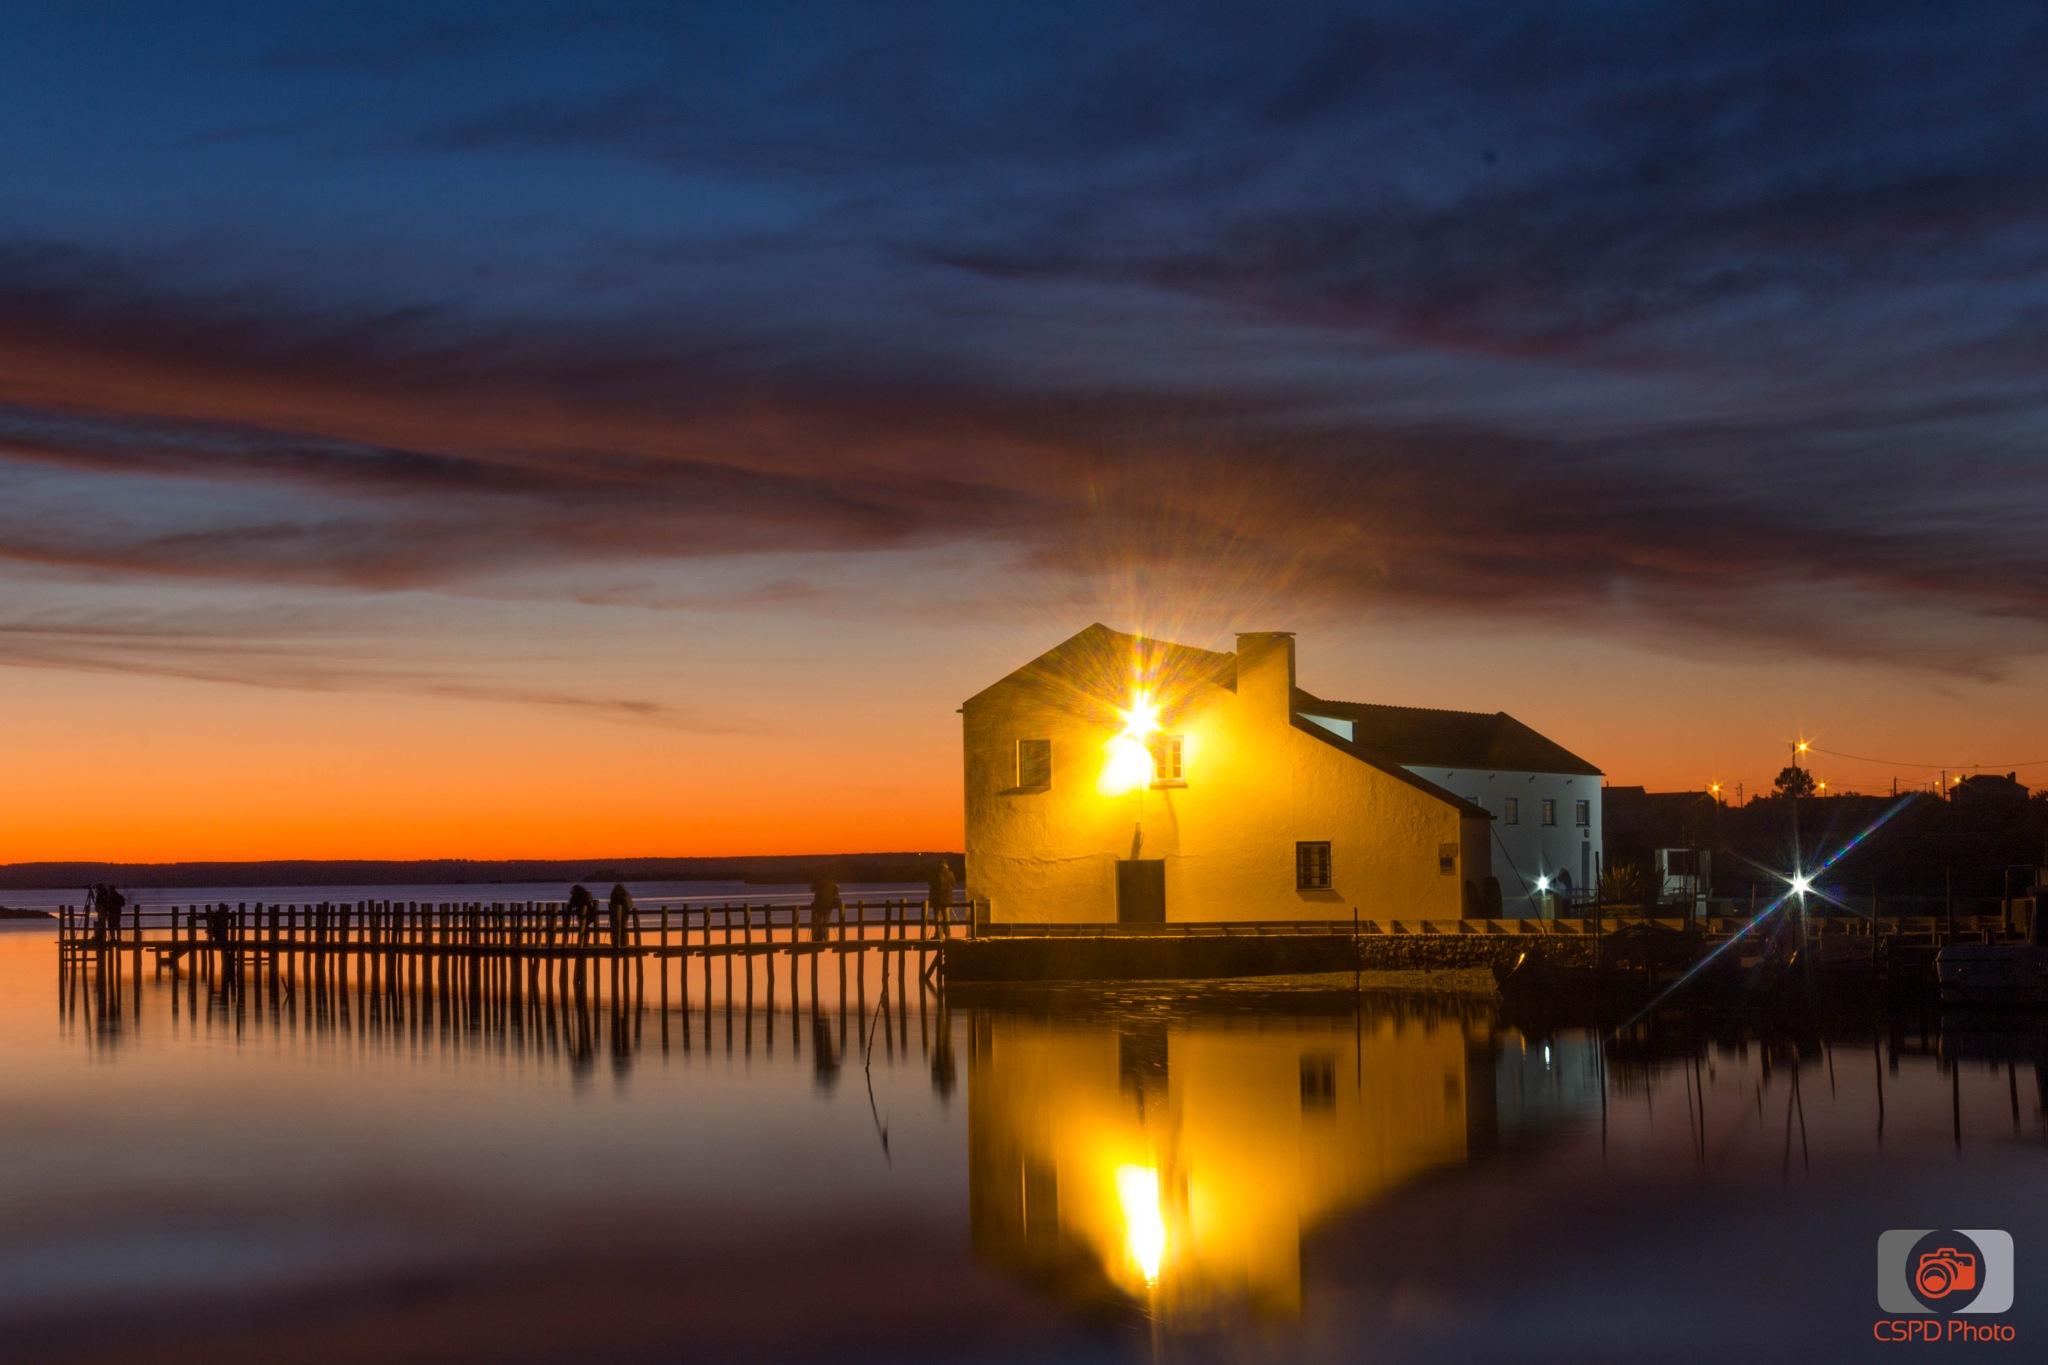 Sunrise at Mouriscas by Carla Dias